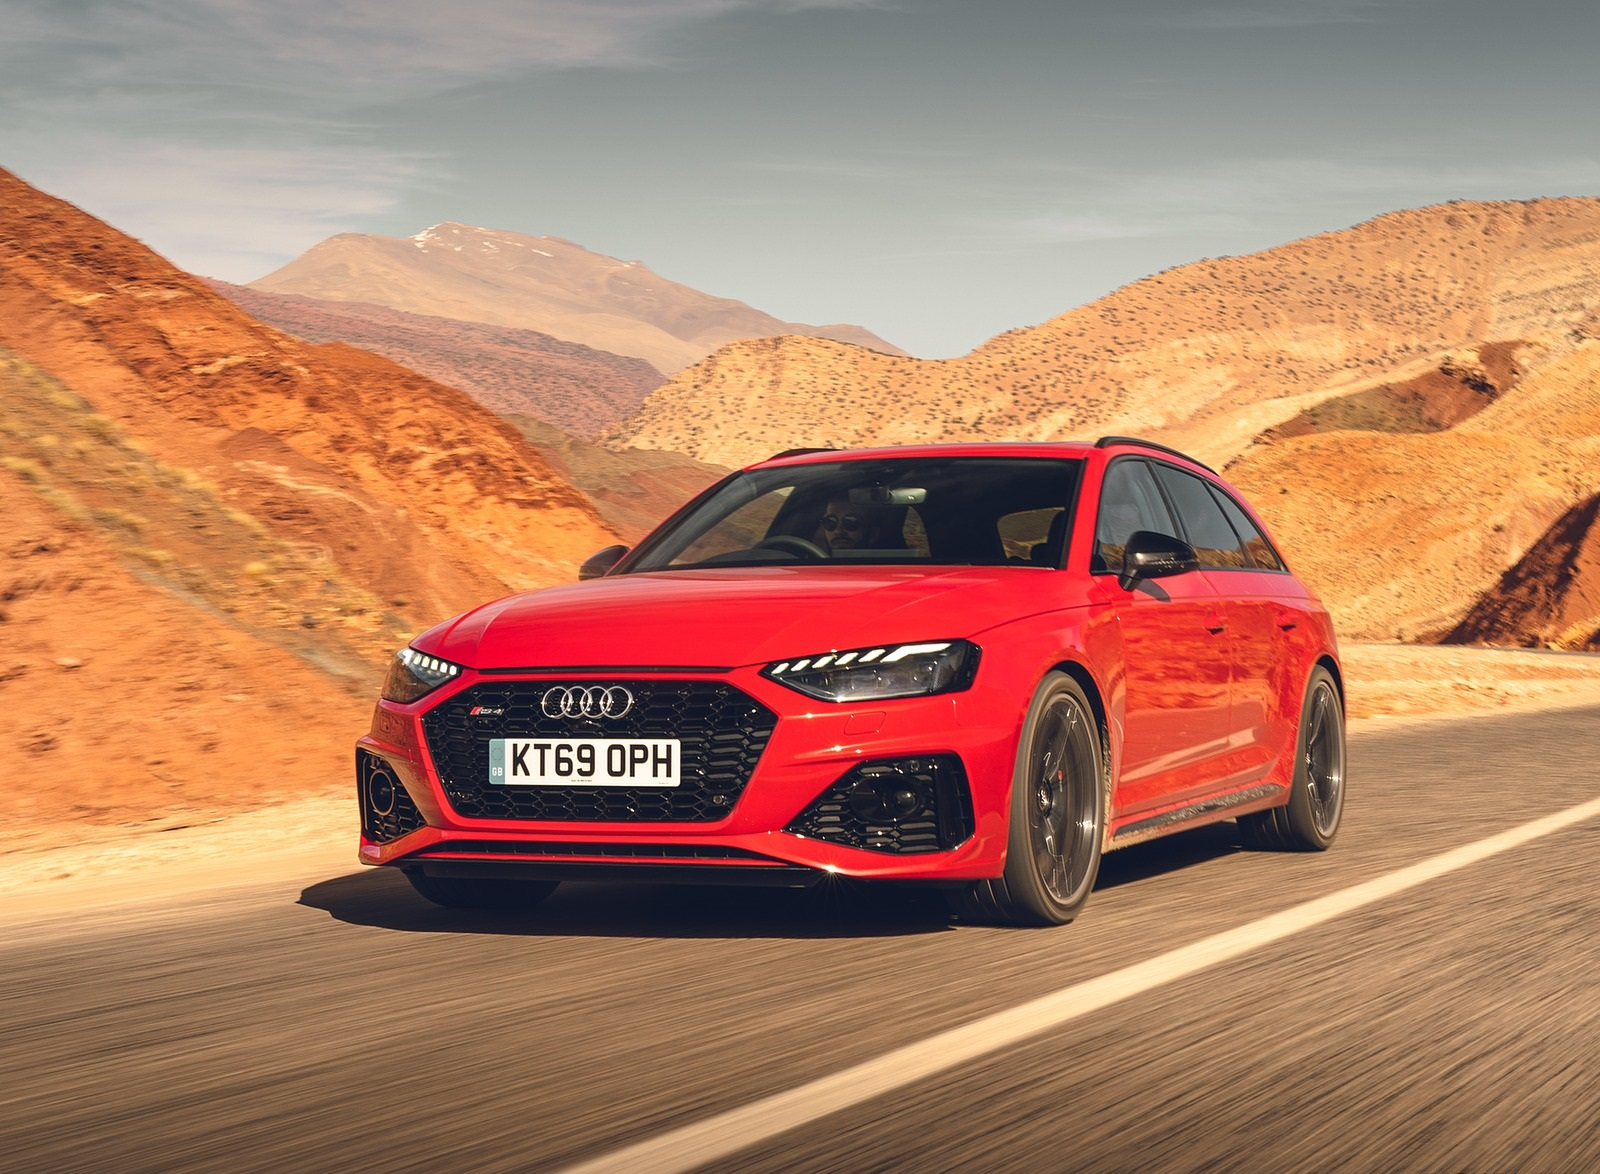 2020 Audi RS 4 Avant (UK-Spec) Front Three-Quarter Wallpapers (1)